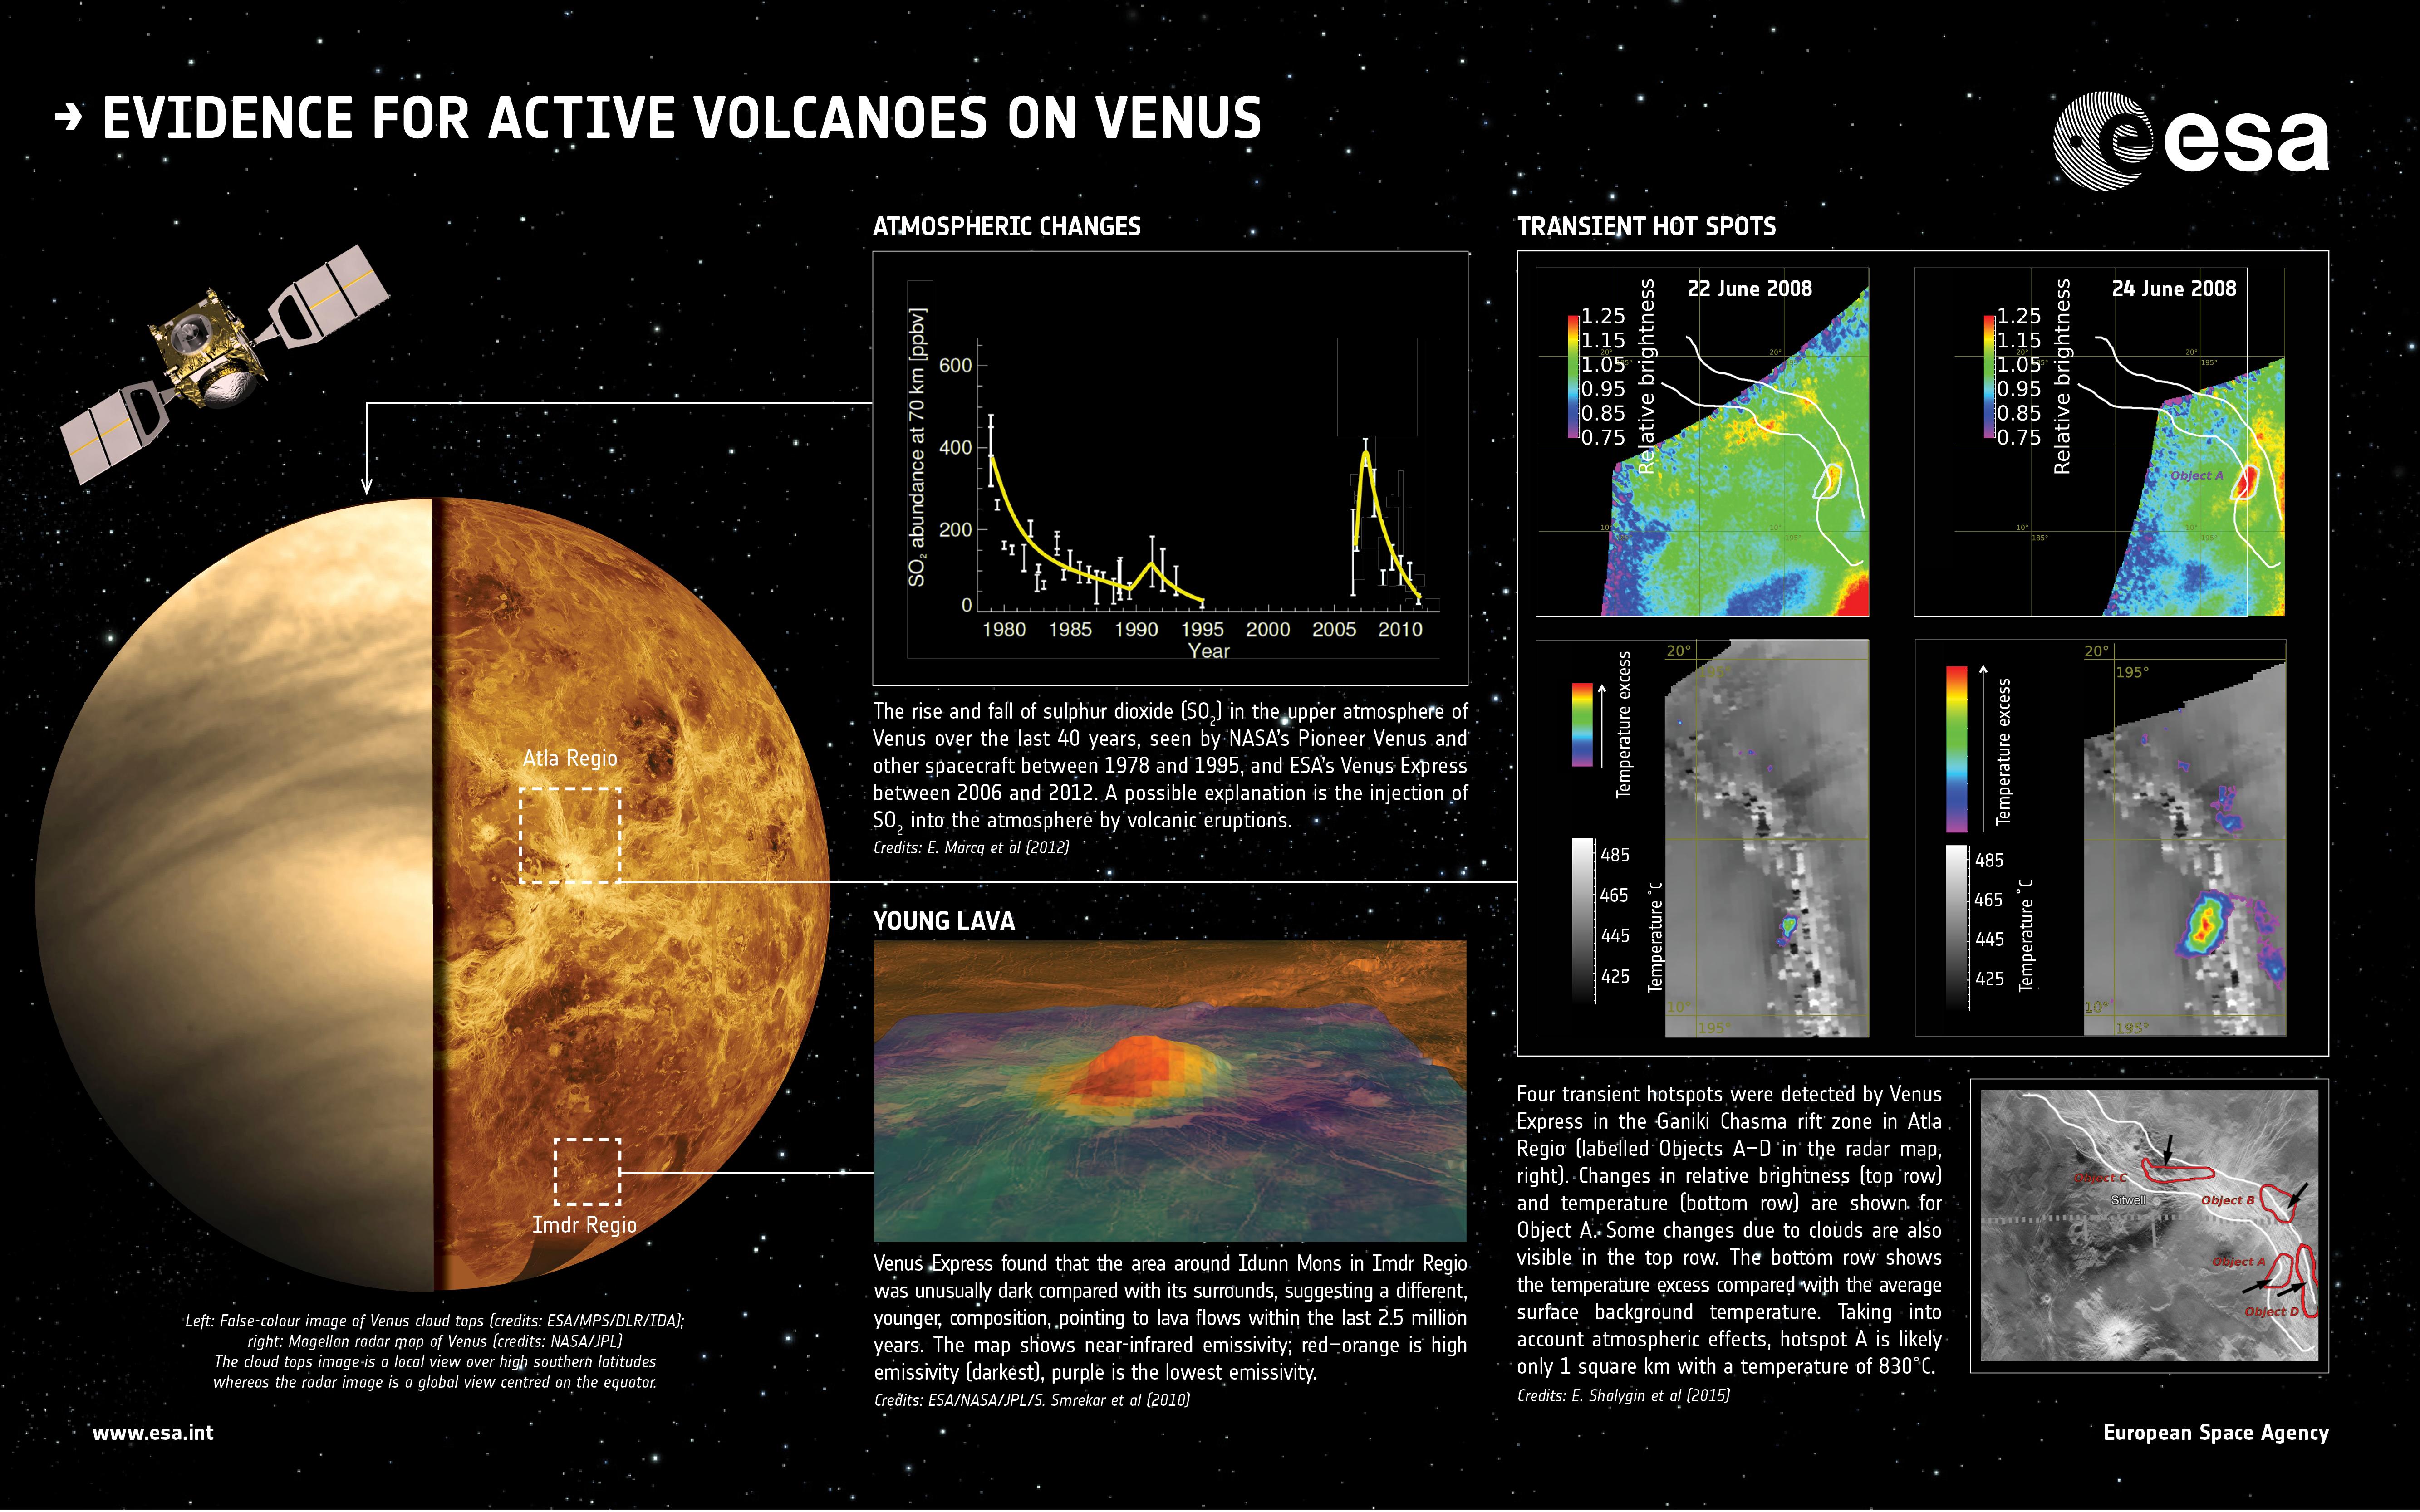 1567215991777-ESA_VenusExpress_Infographic_Volcanoes.jpg